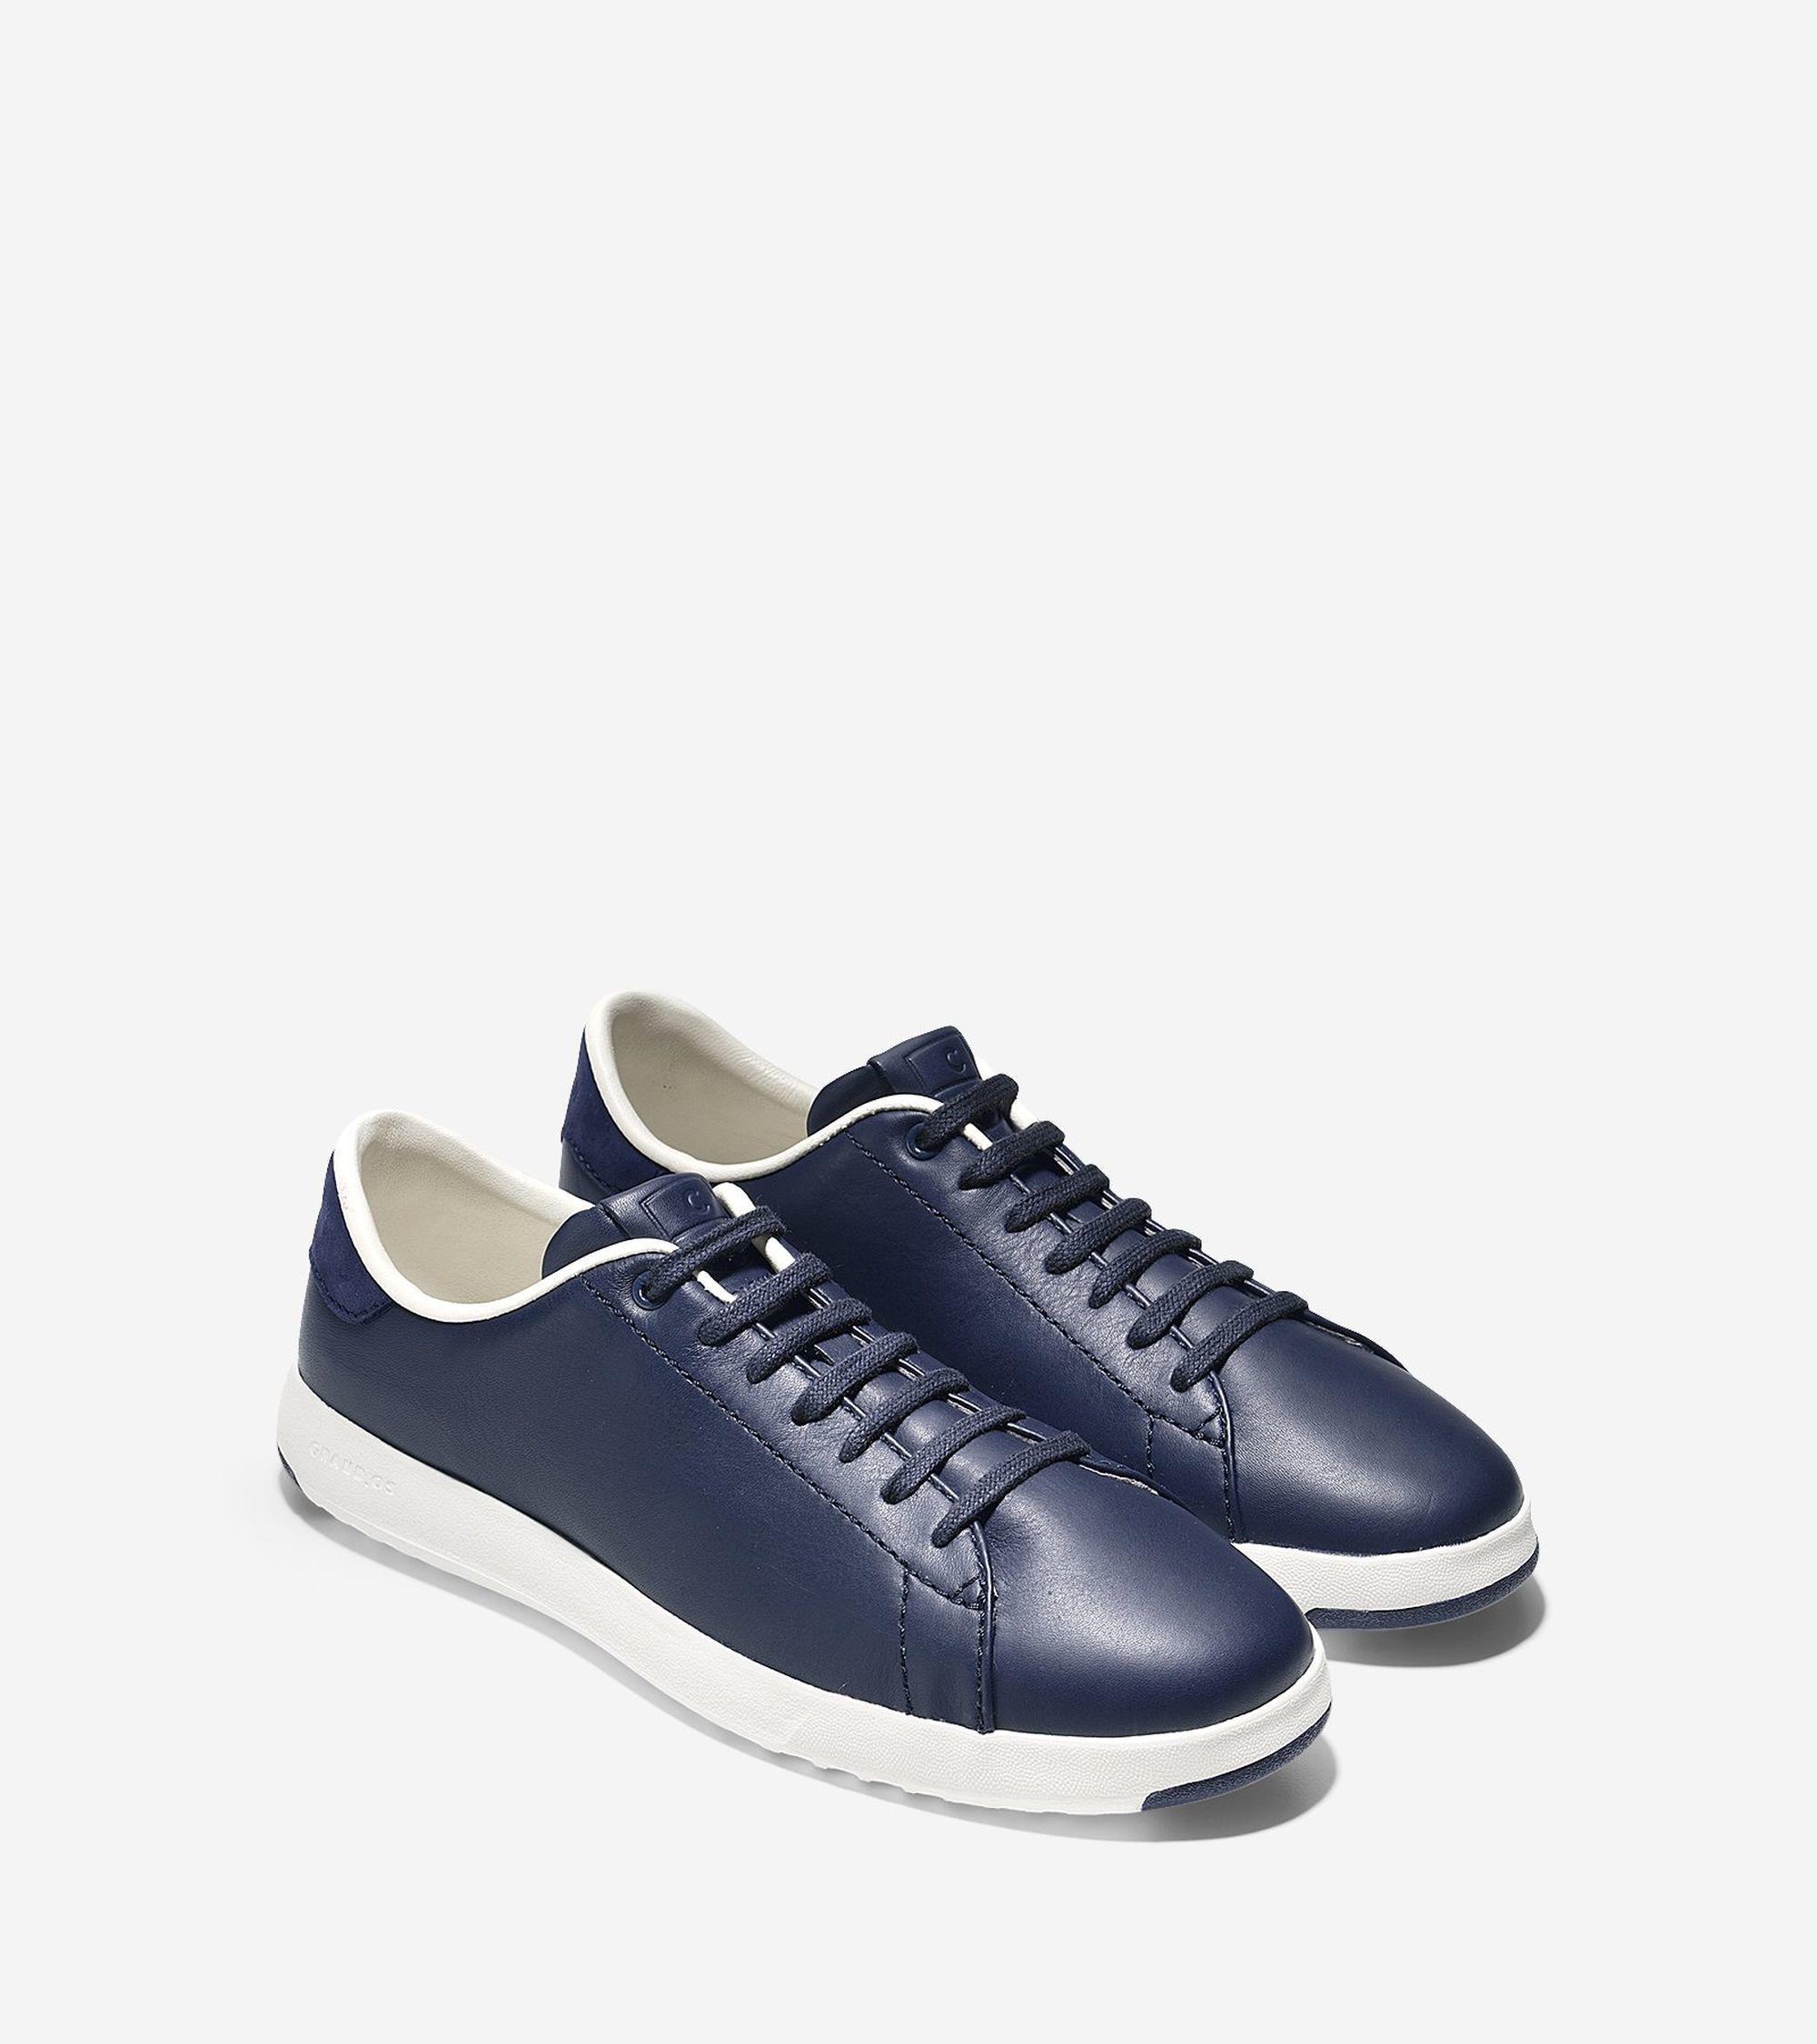 cole haan s grandpr 248 tennis sneaker in blue lyst